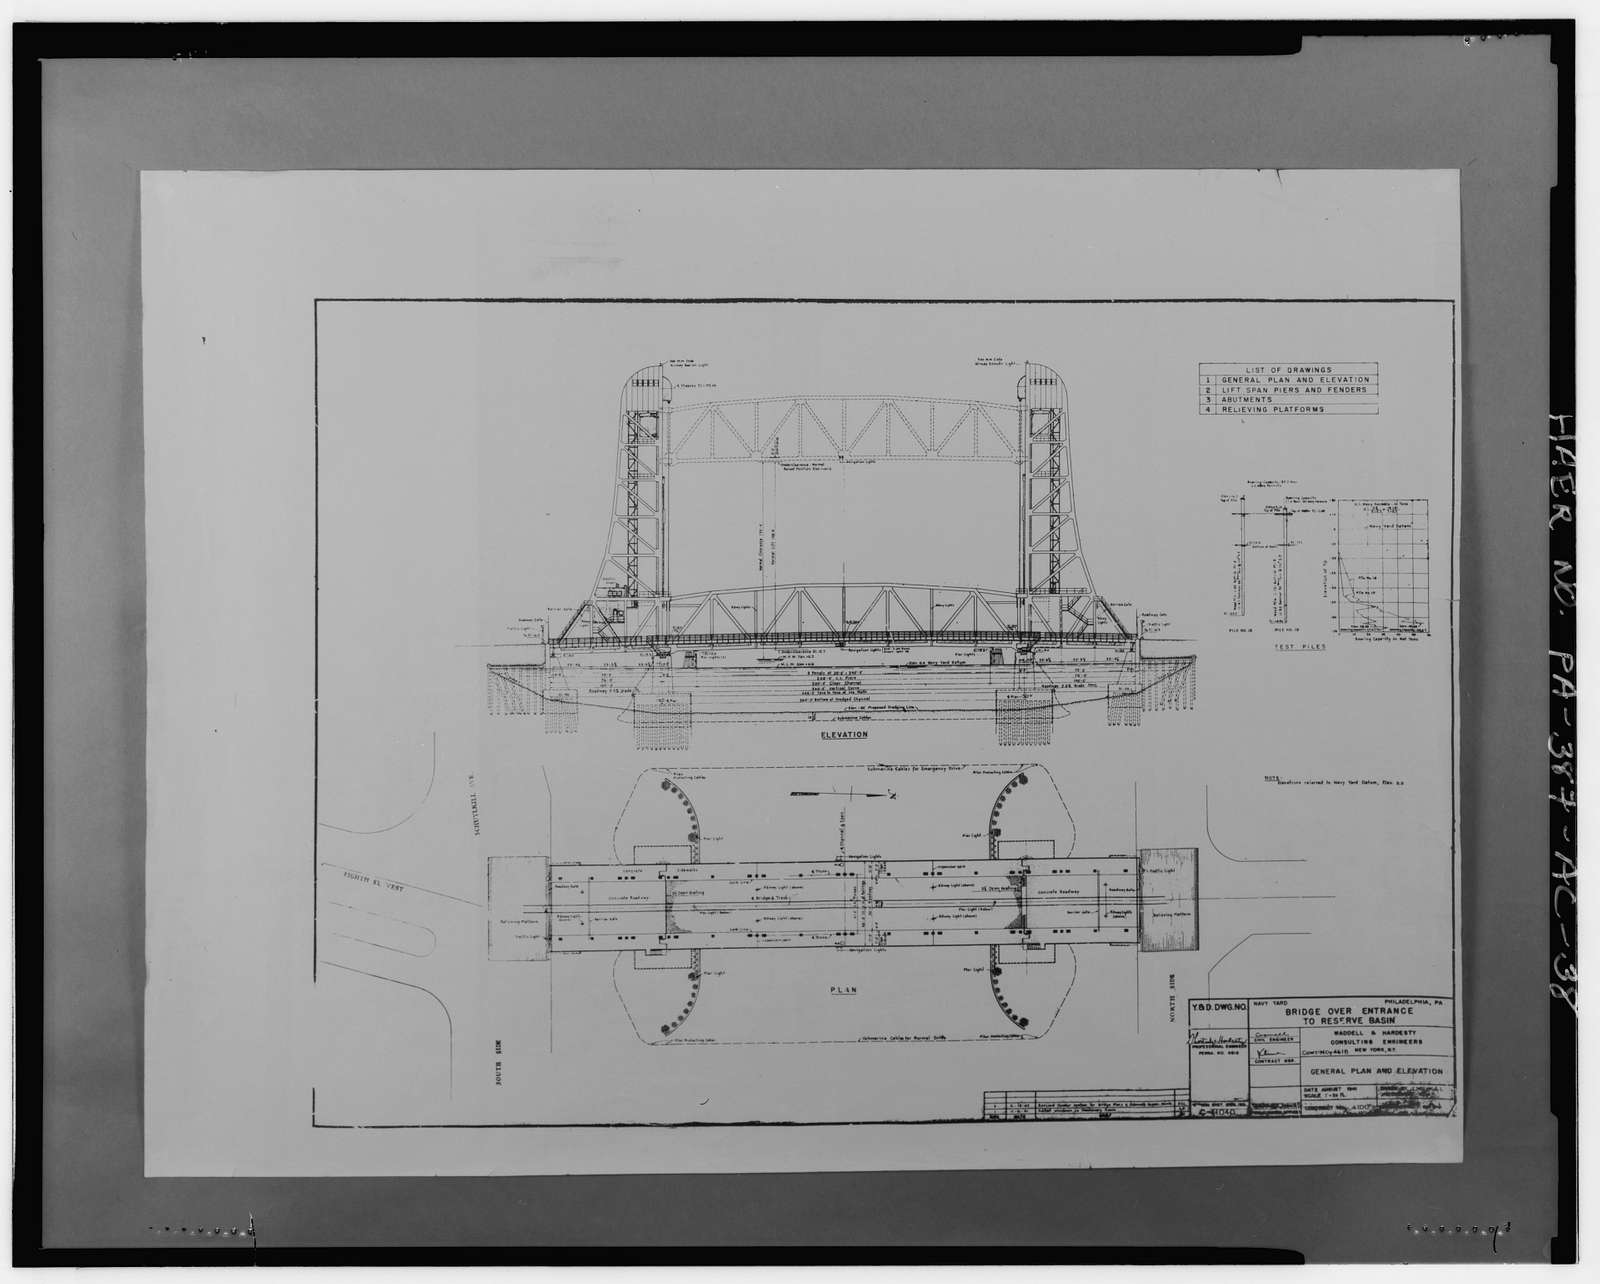 Naval Base Philadelphia-Philadelphia Naval Shipyard, Lift Bridge, Mouth of Reserve Basin, League Island, Philadelphia, Philadelphia County, PA